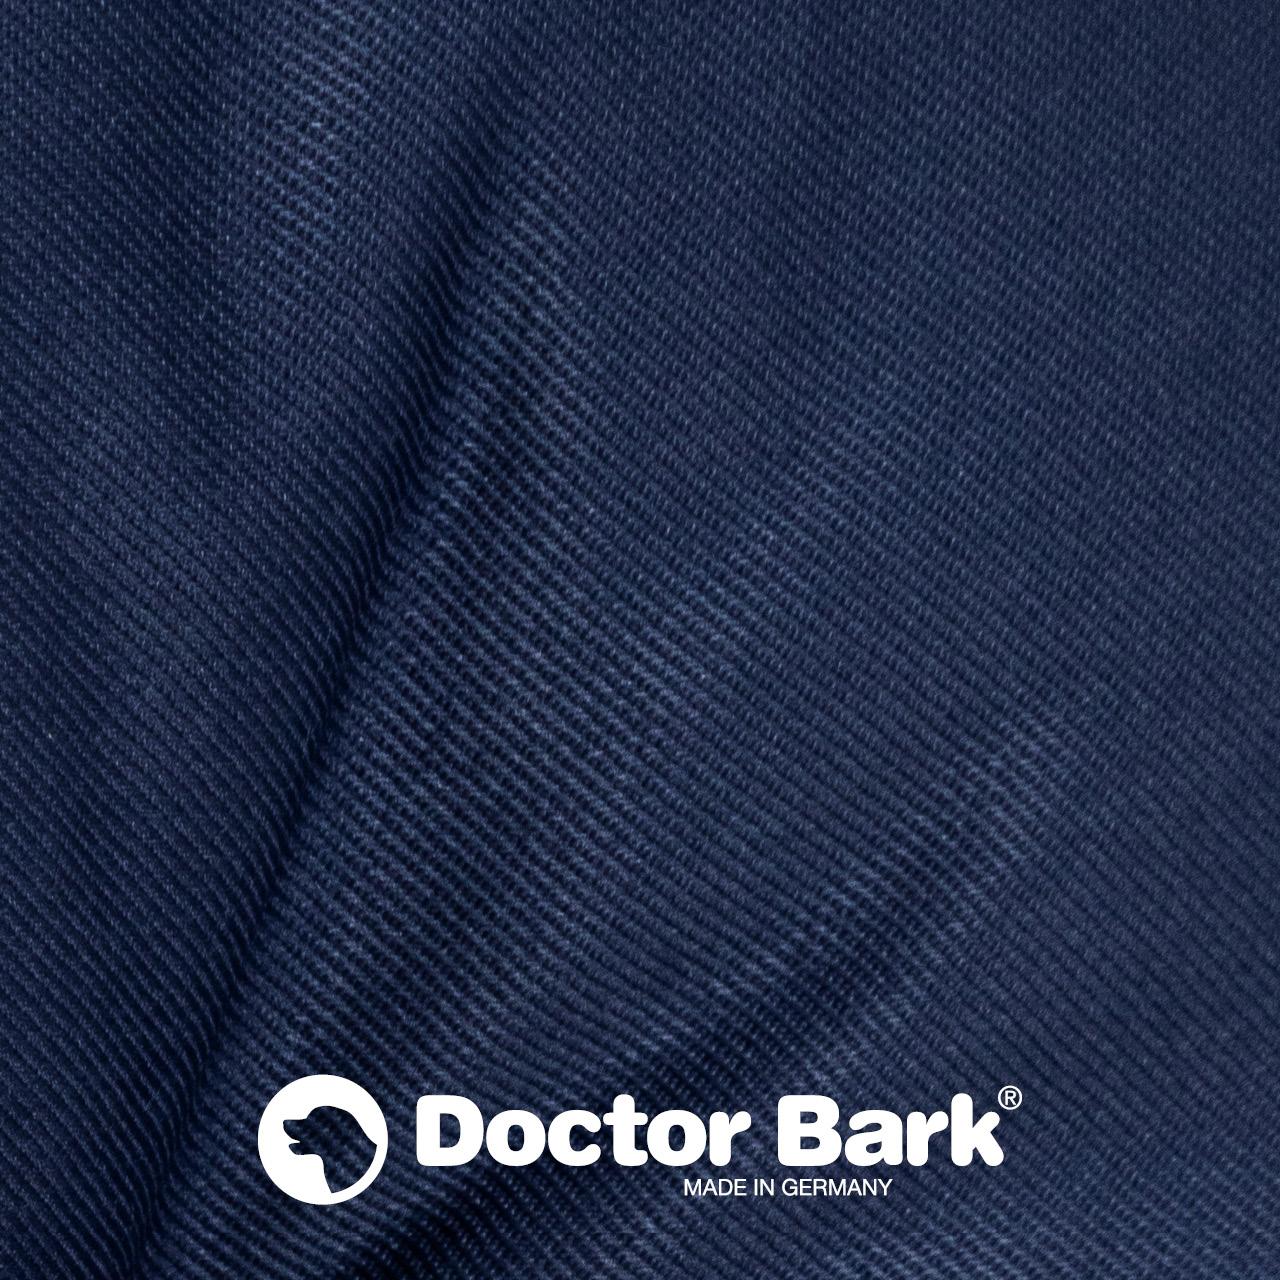 rundes Hundebett mit orthopädischem Wendekissen Doctor Bark - königsblau blau